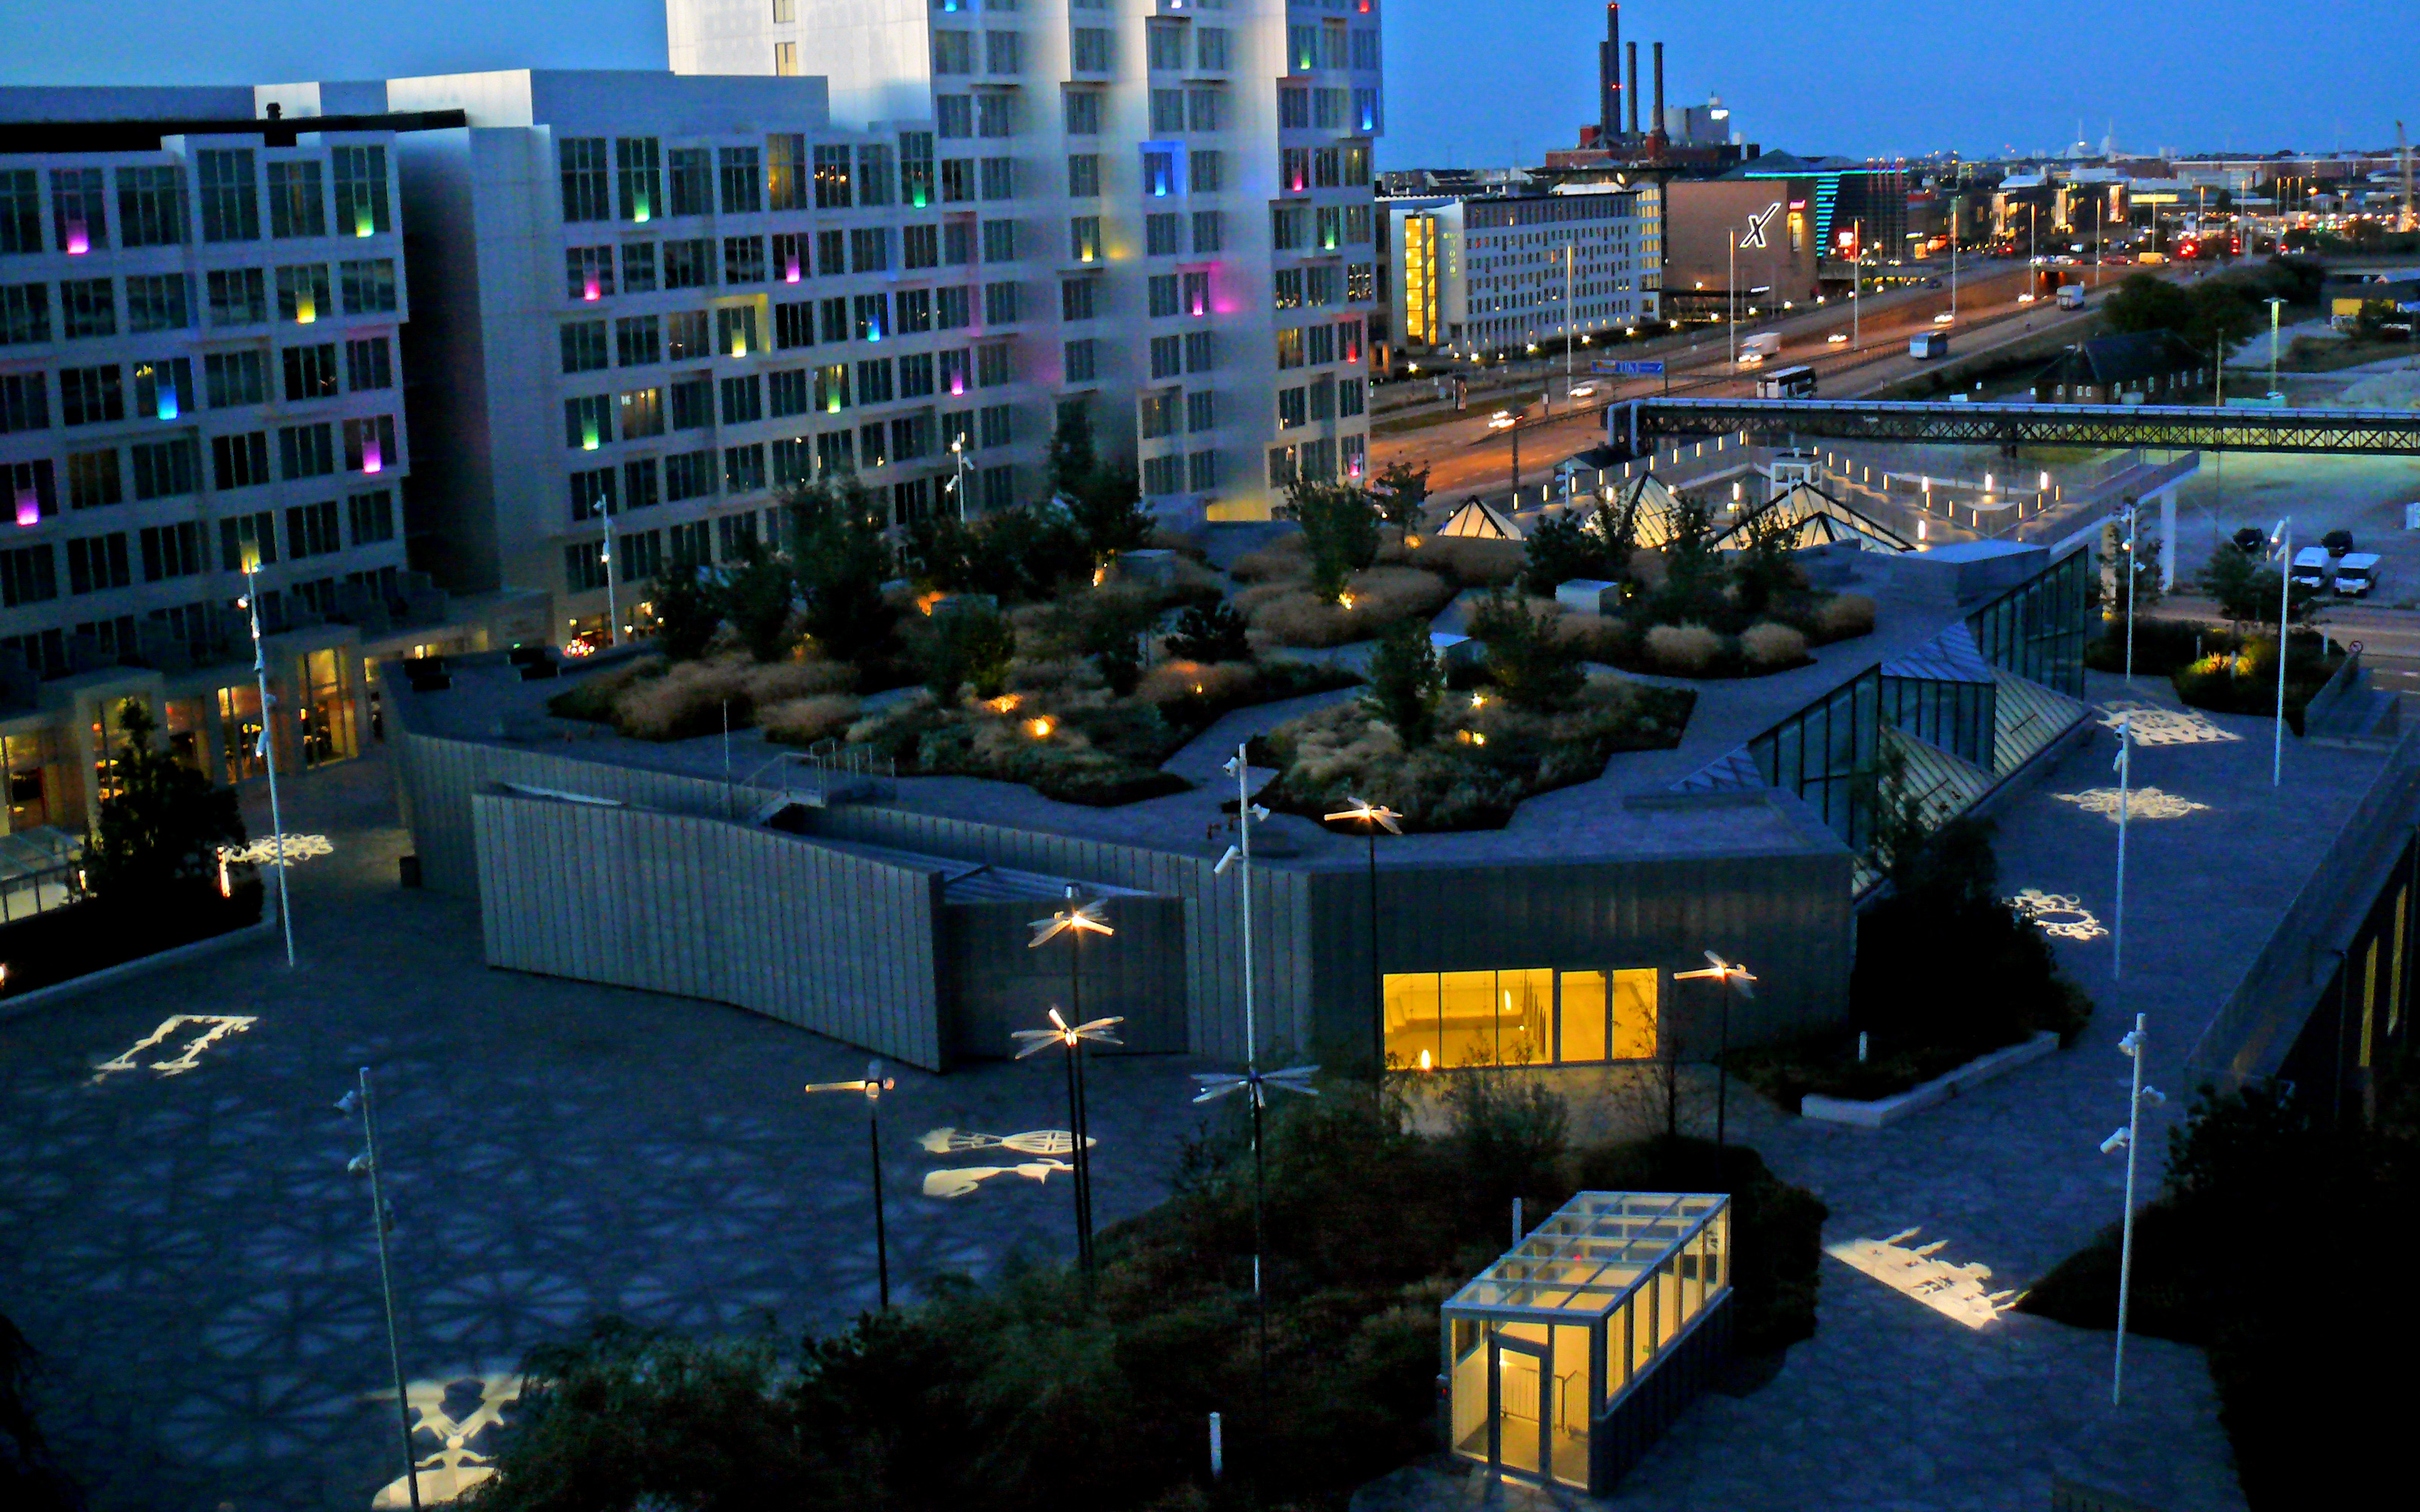 Tivoli Congress Centre Copenhagen Zinco Green Roof Systems